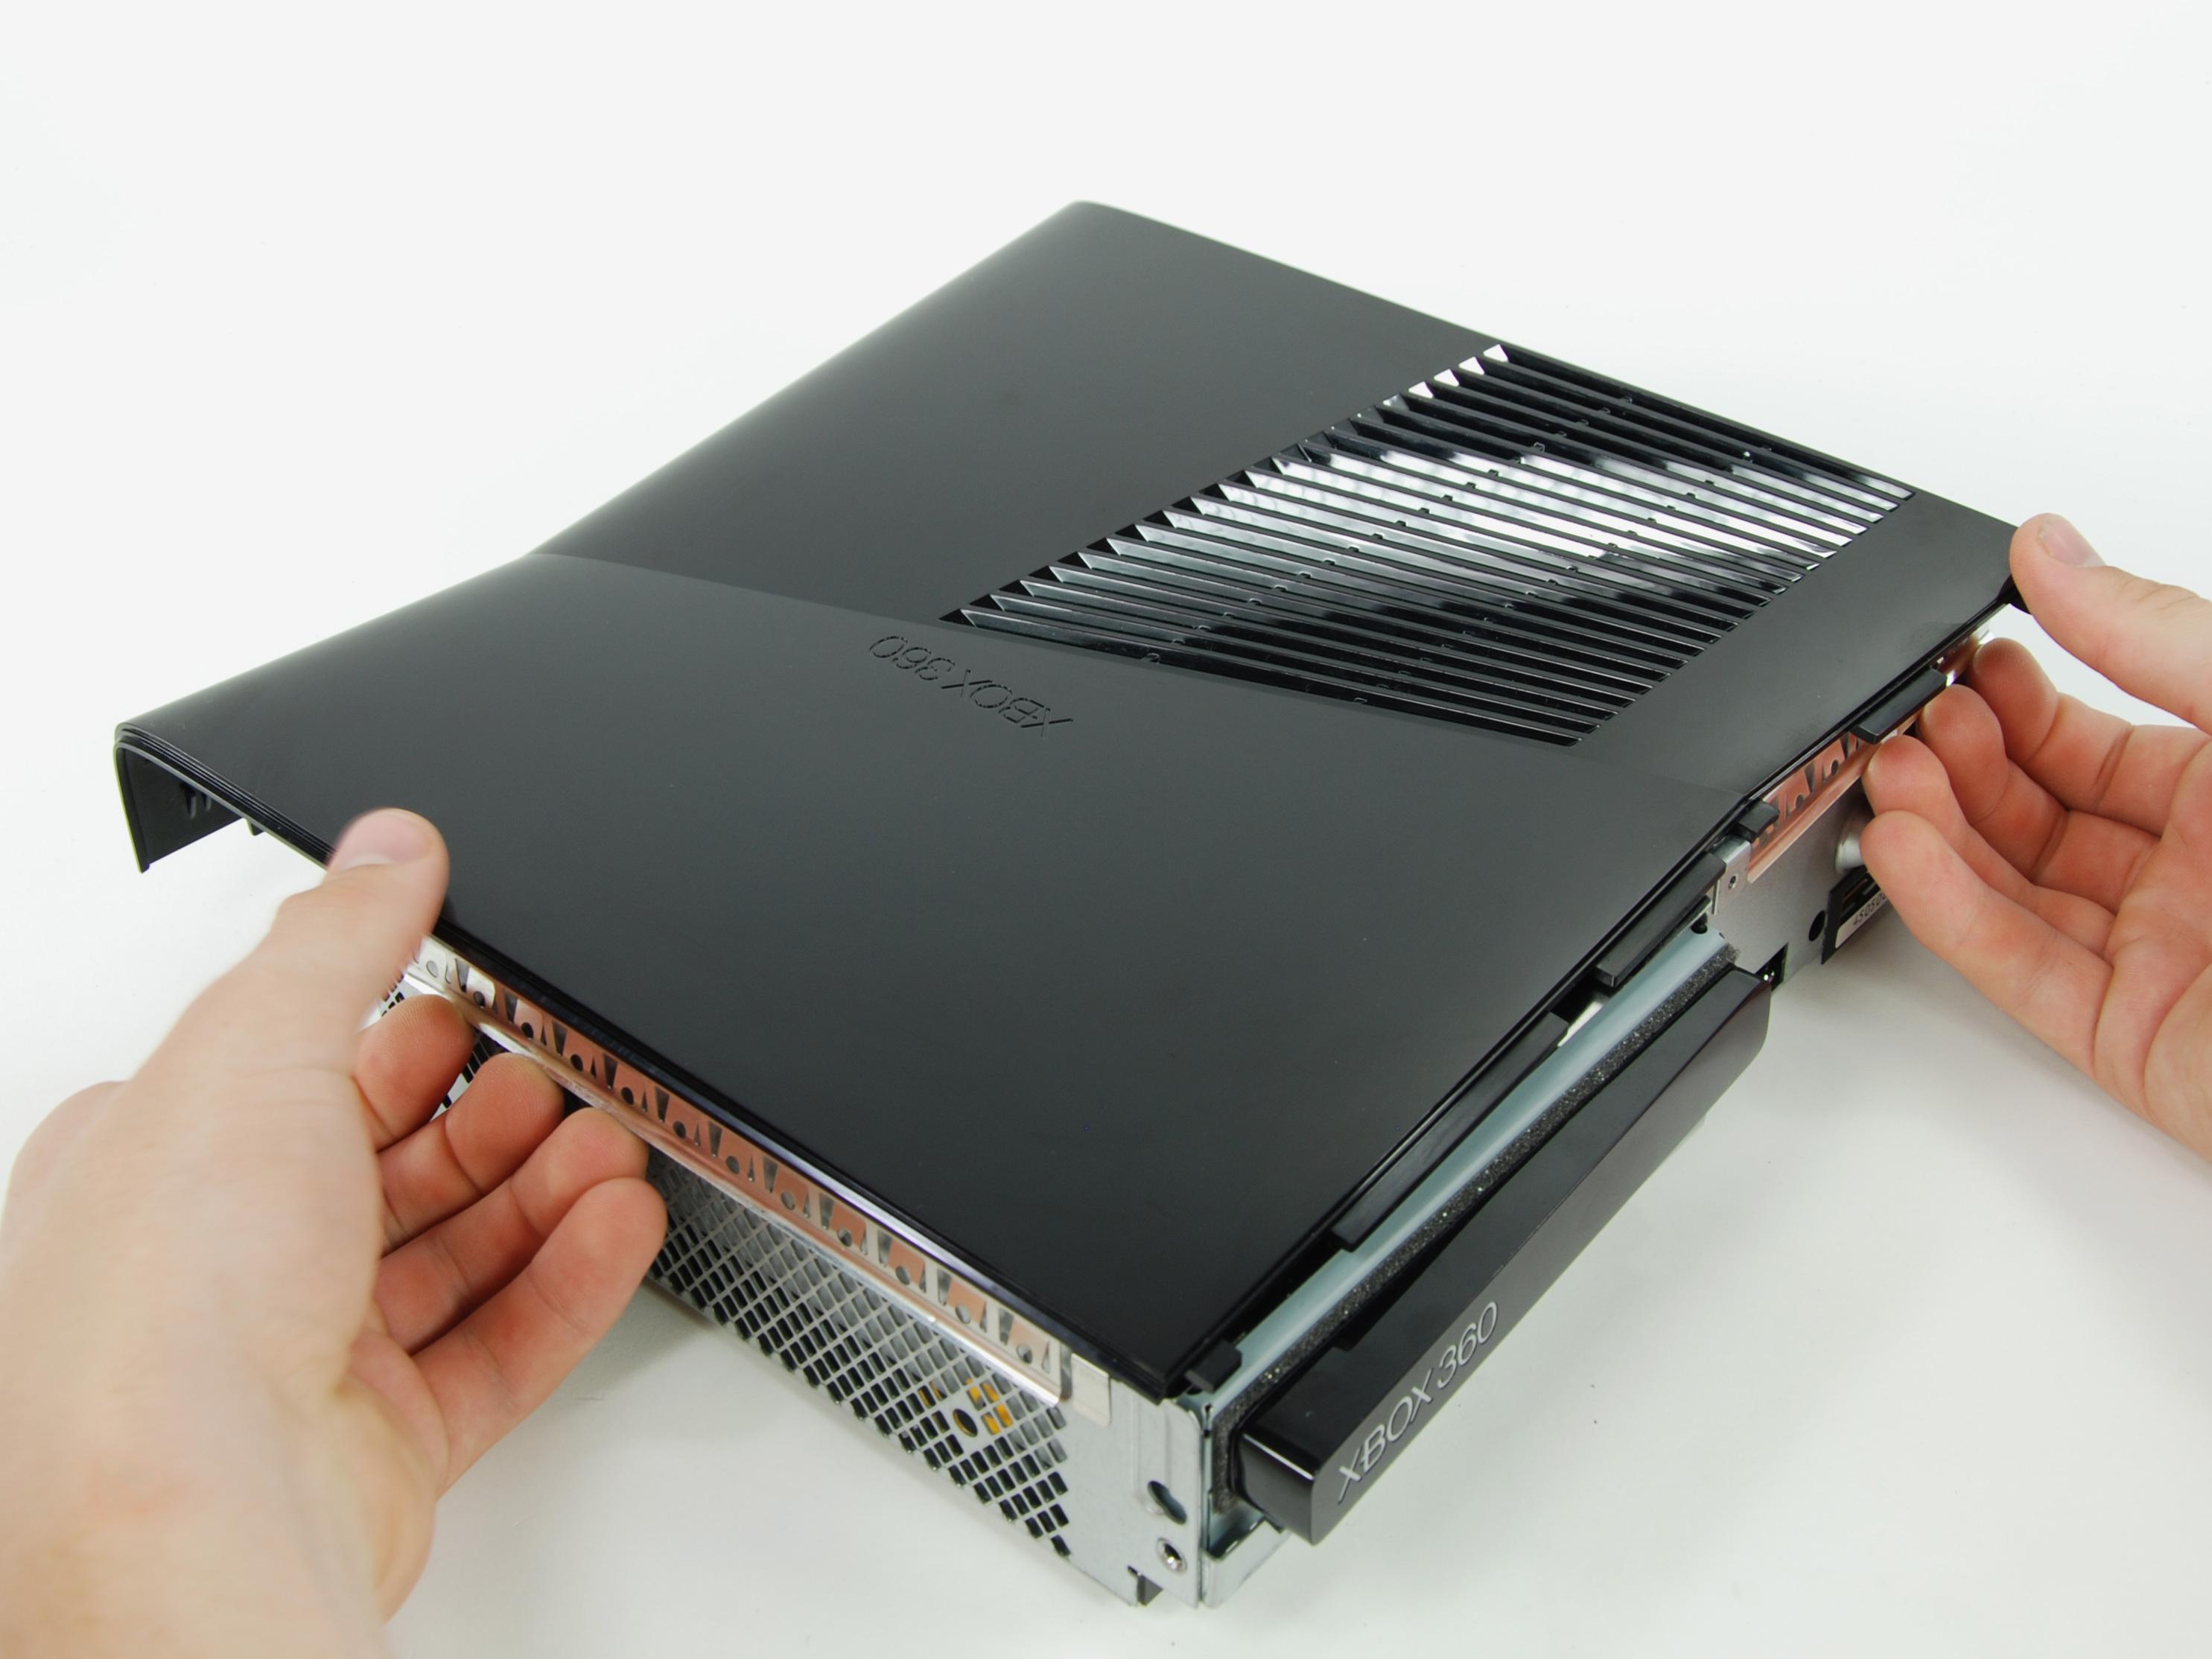 Xbox 360 S Repair Ifixit Inside Diagram Slim Motherboard Right Case